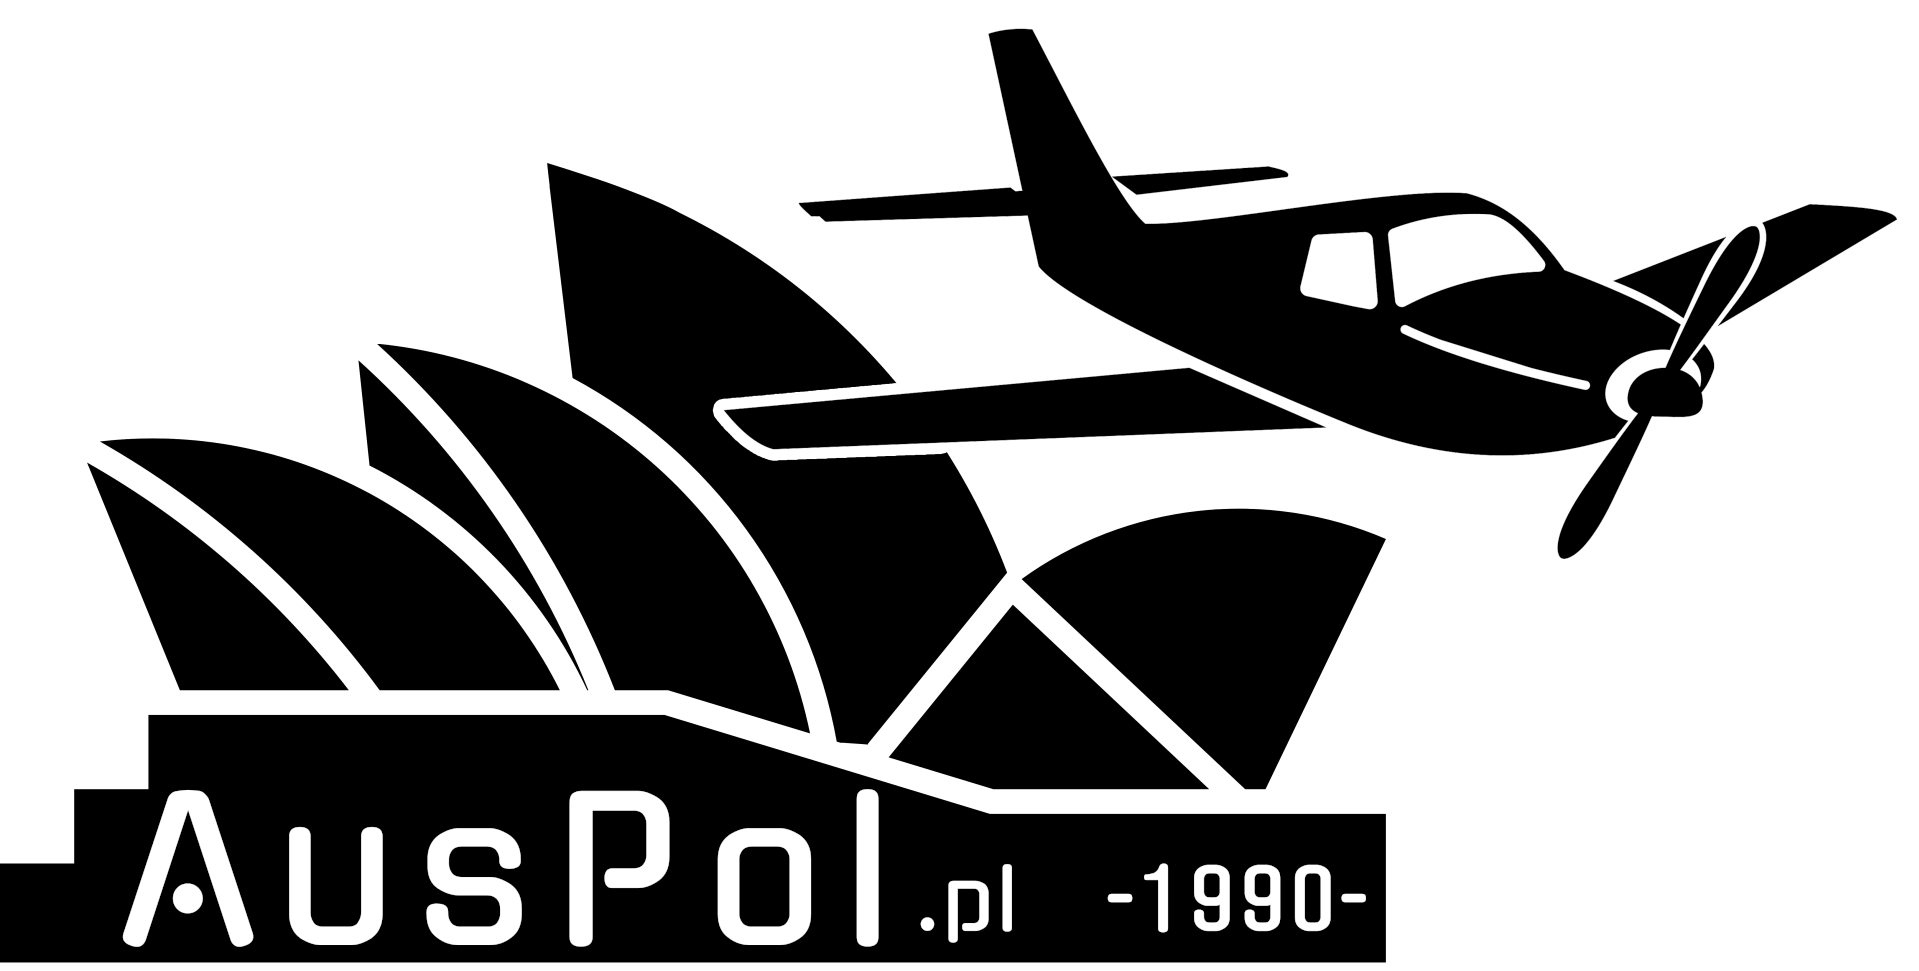 auspol.pl